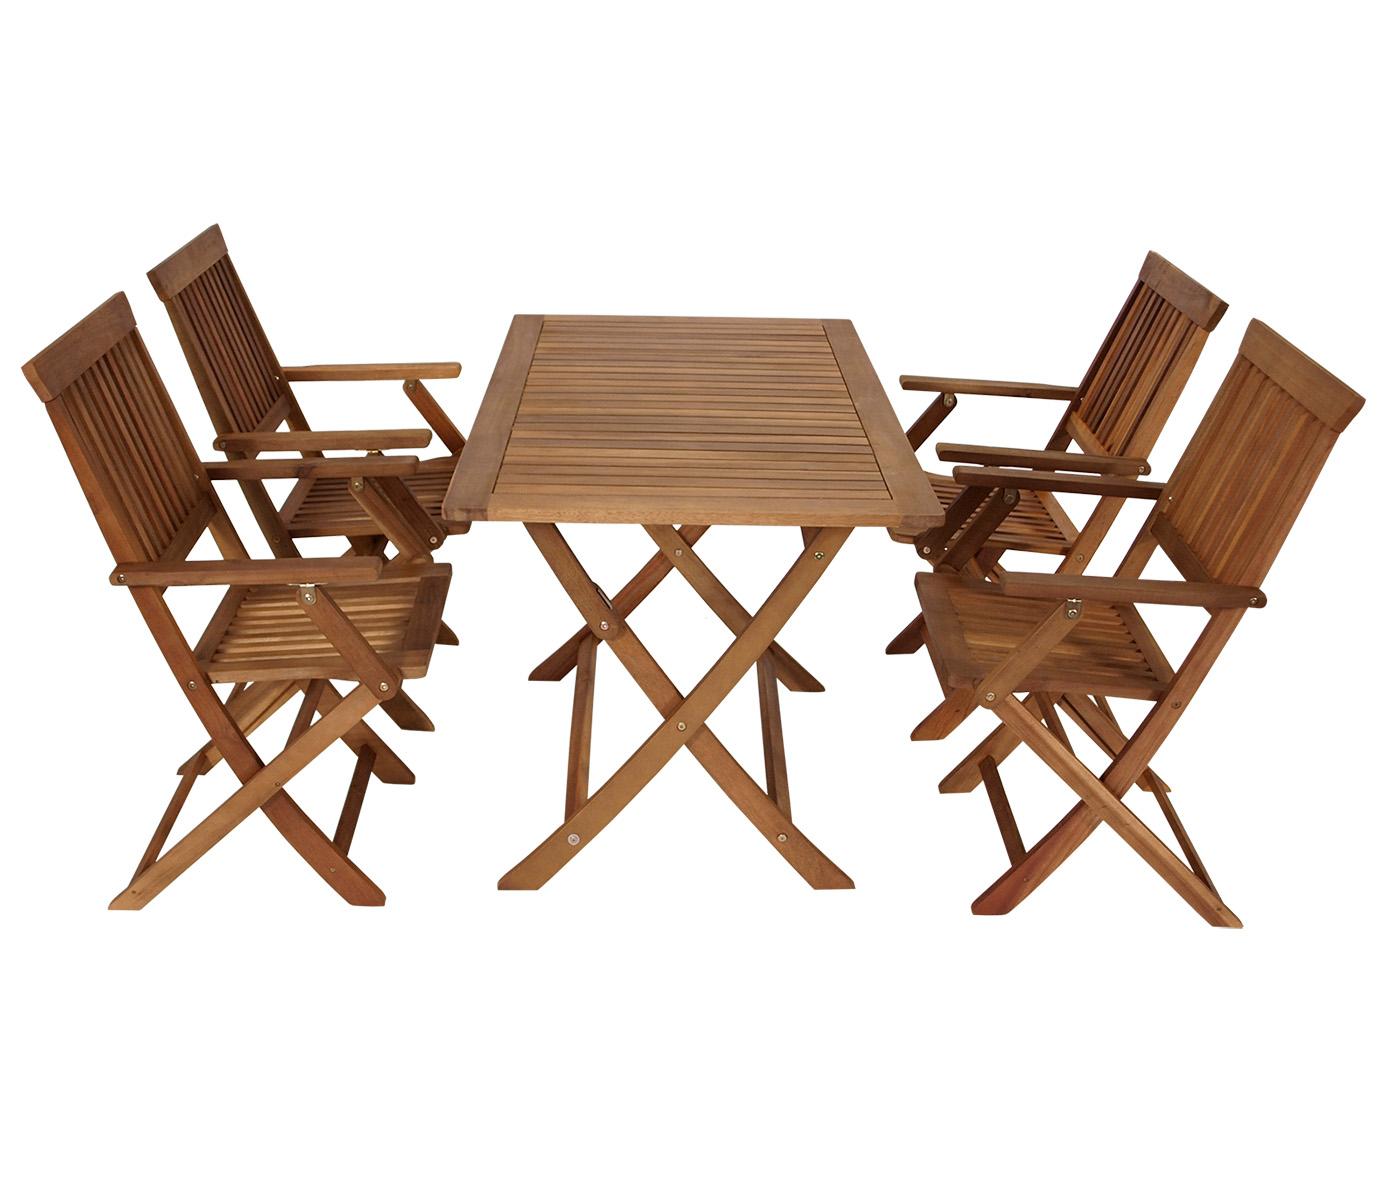 gartengarnitur sitzgruppe klappgarnitur gartenm bel set tobago 5 teilig akazie ebay. Black Bedroom Furniture Sets. Home Design Ideas